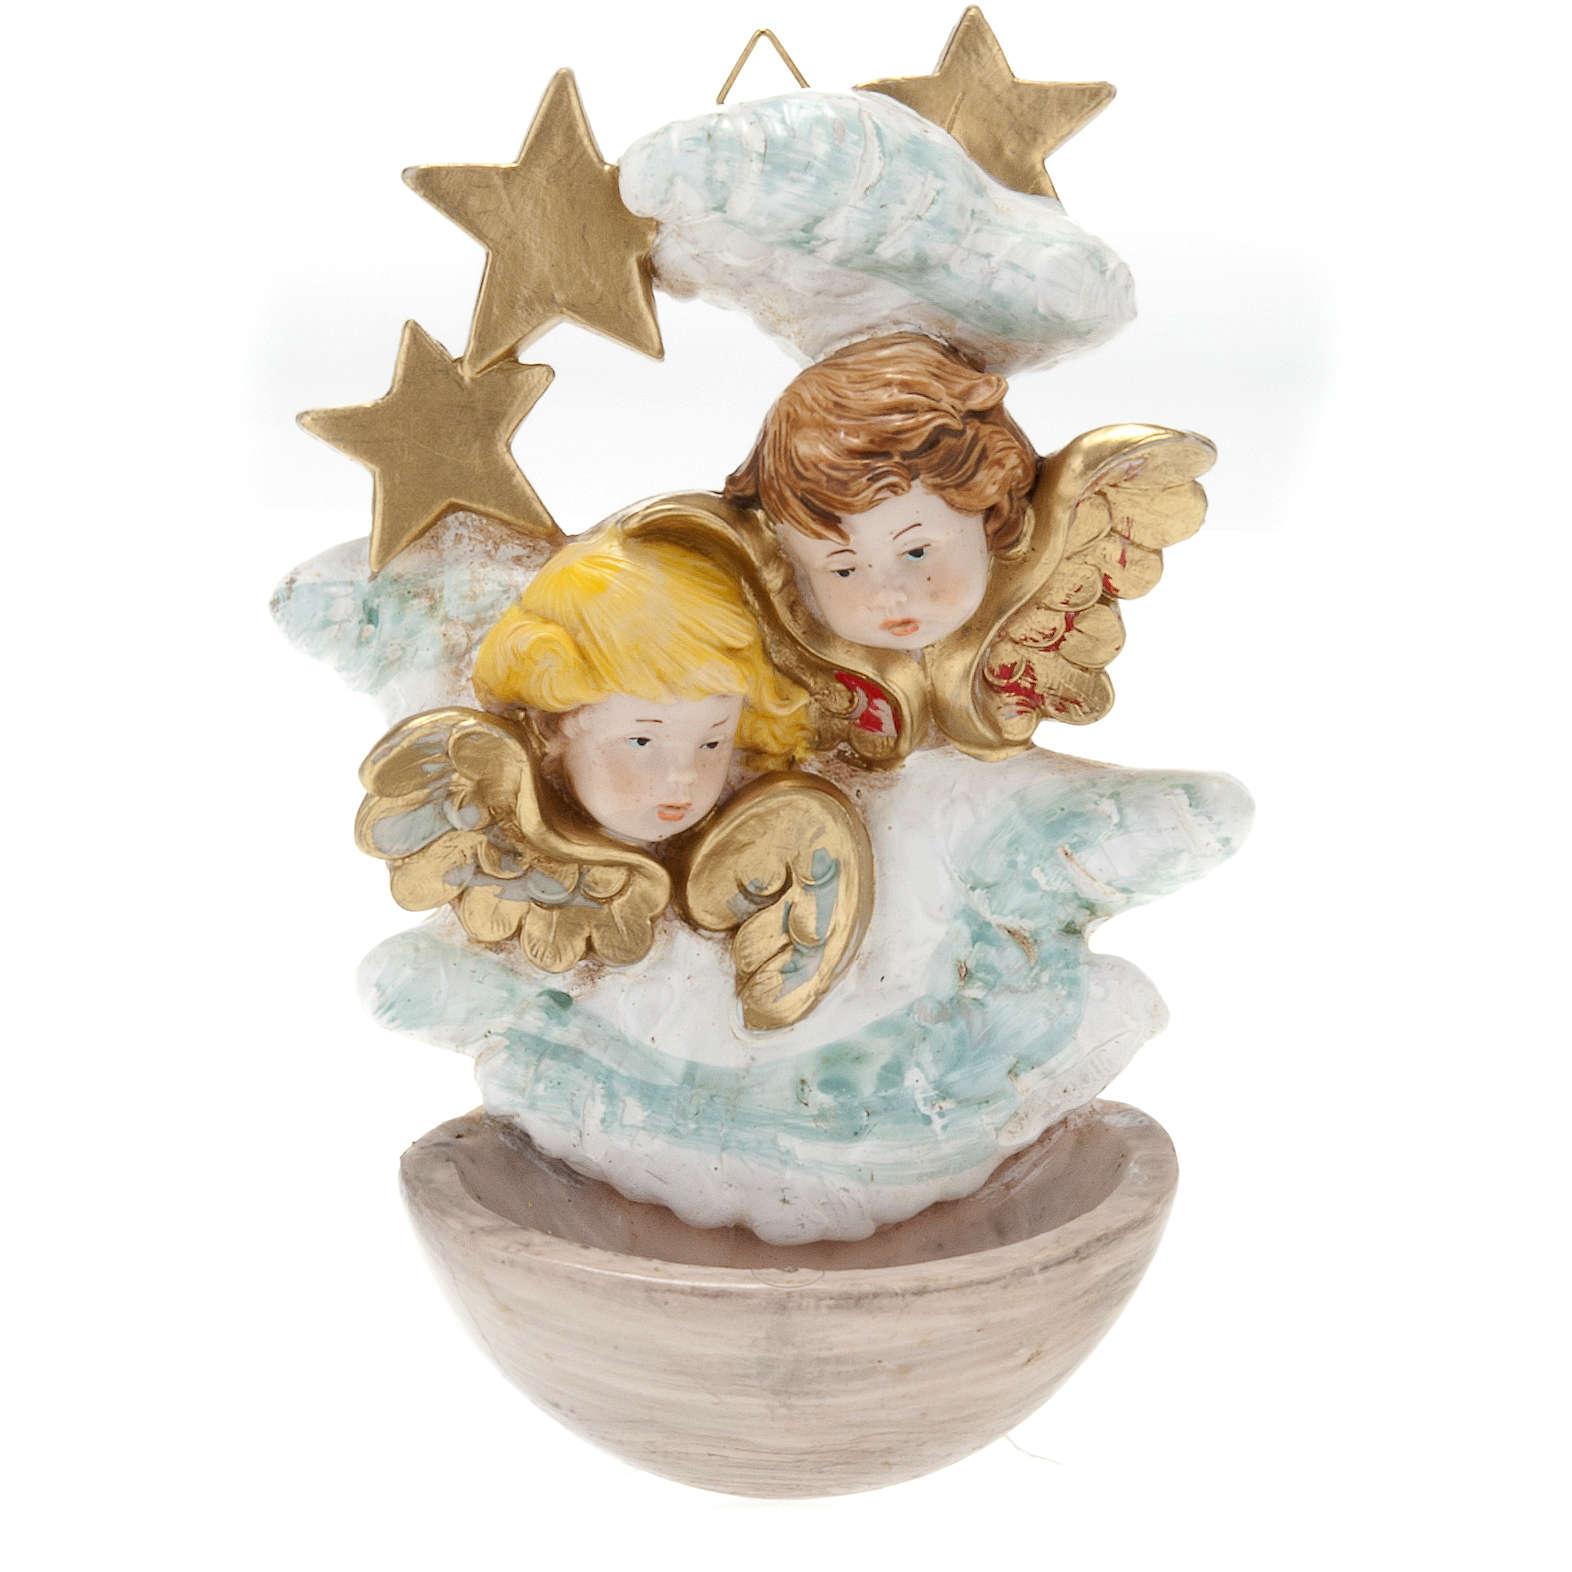 Pila de agua bendita angelitos con estrellas plástico Fontanini 4